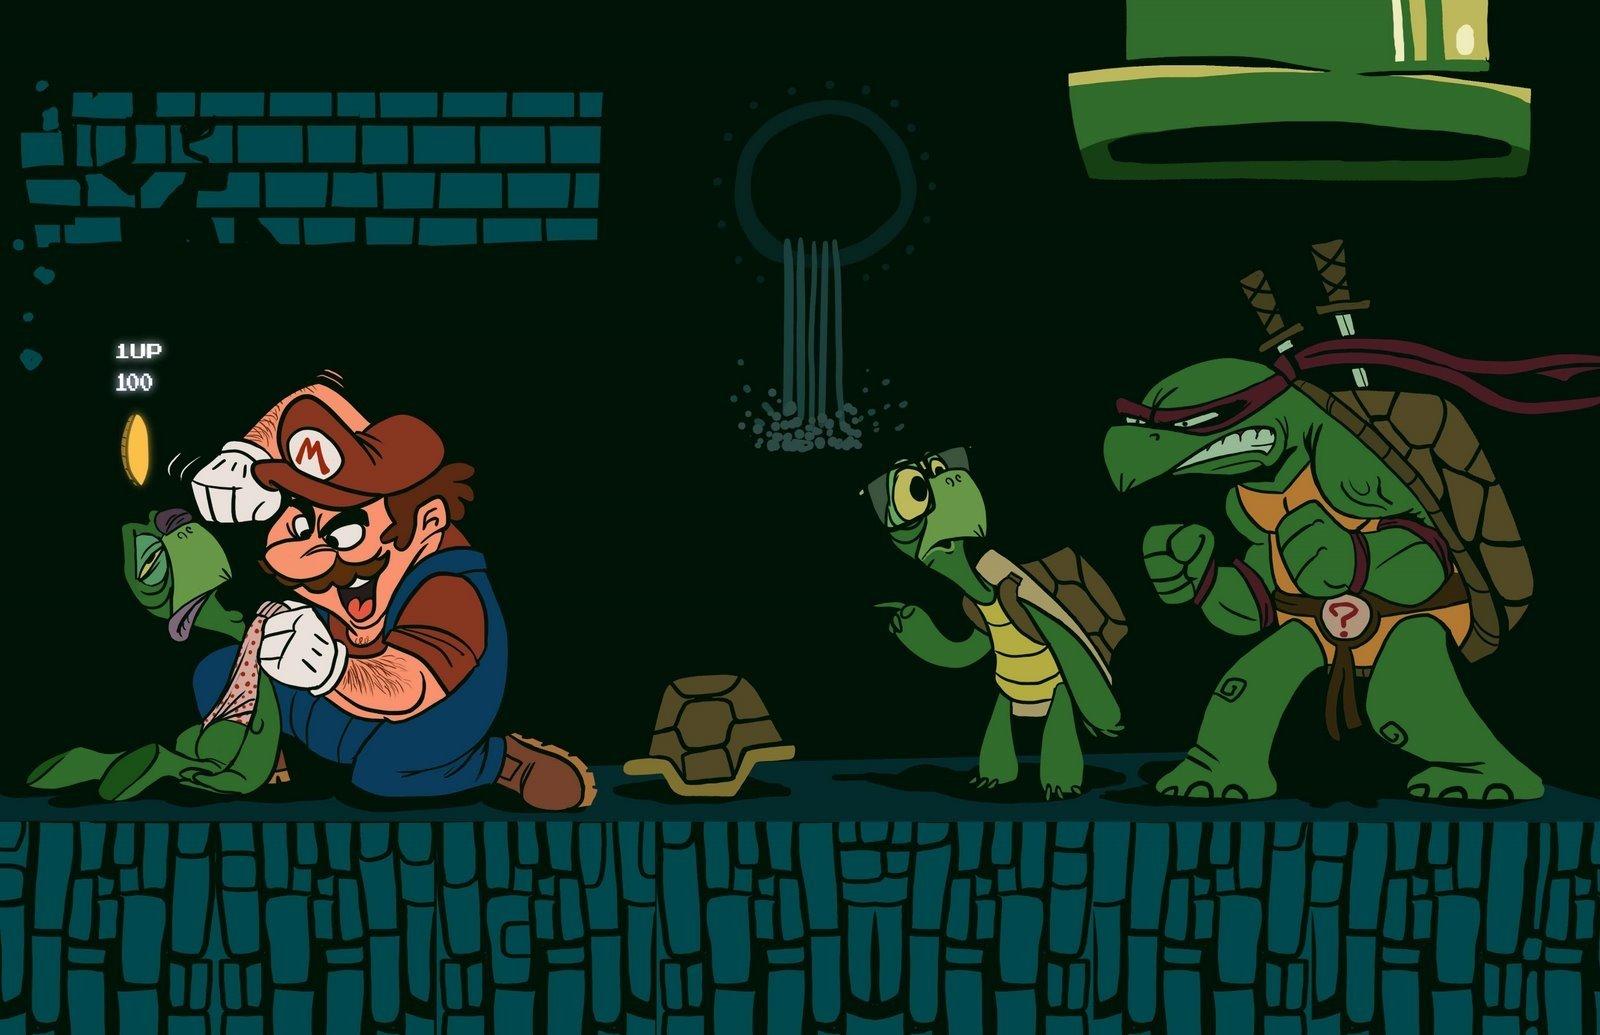 Video Game - Crossover  Mario Super Mario Bros. Teenage Mutant Ninja Turtles Raphael (TMNT) Wallpaper